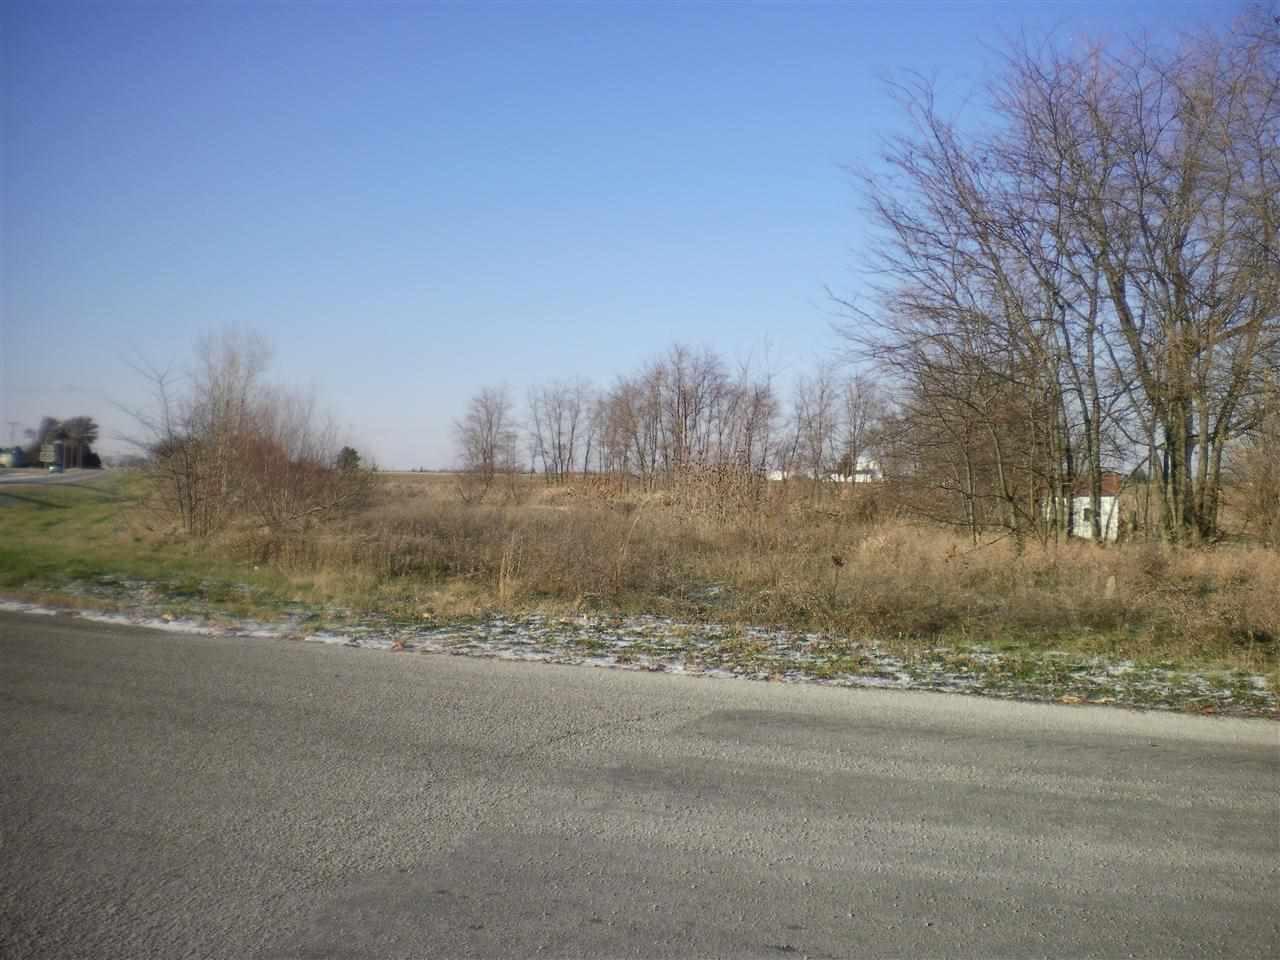 Real Estate for Sale, ListingId: 30879555, Orion,IL61273